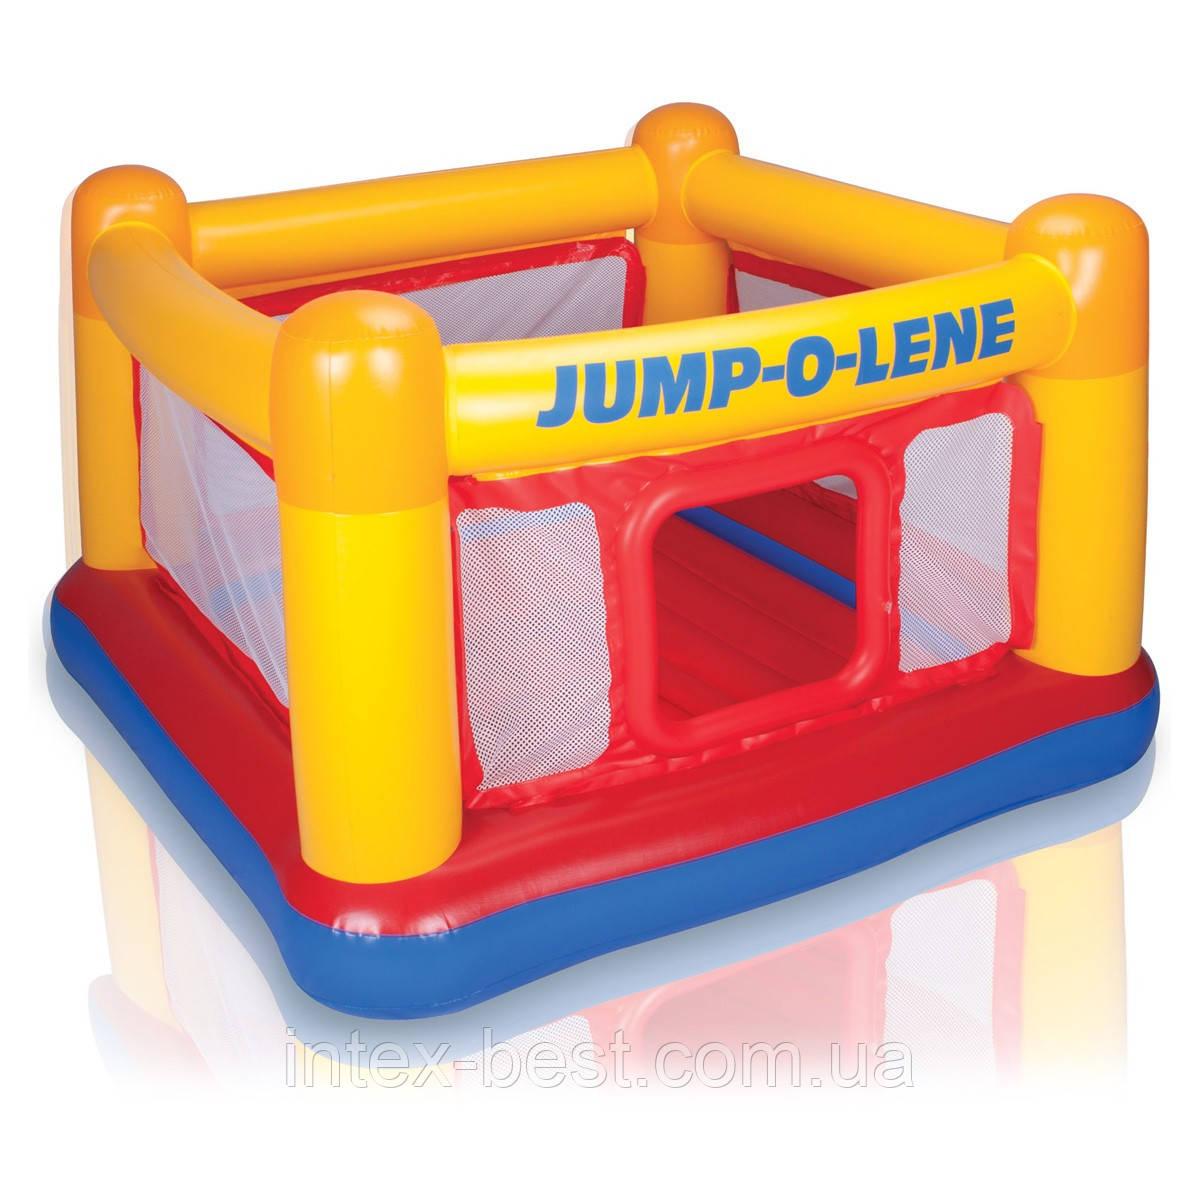 Intex 48260 - надувной батут Jump-O-Lene 174x174x112 см